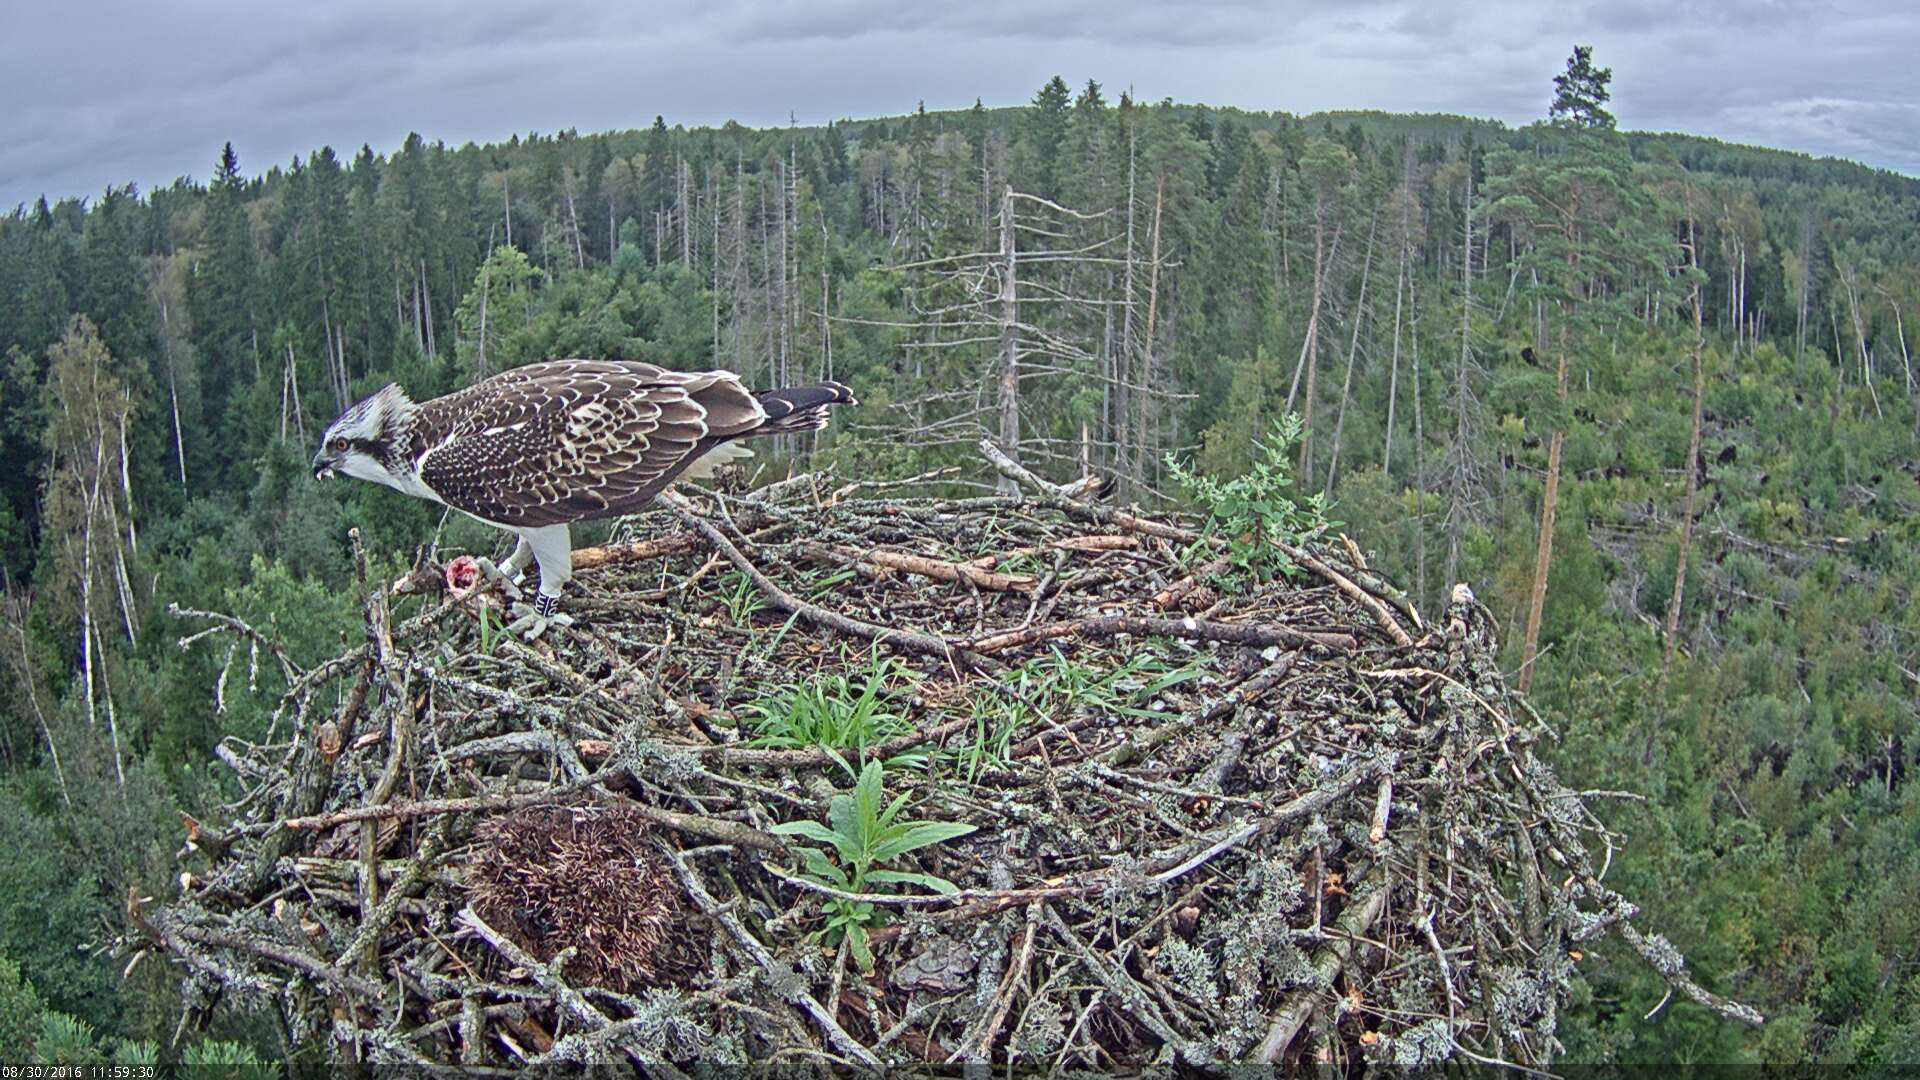 Estonian Osprey Nest ~Irma & Ivo~ 2016 - Page 2 Kalakotkas2-2016-08-30-11-59